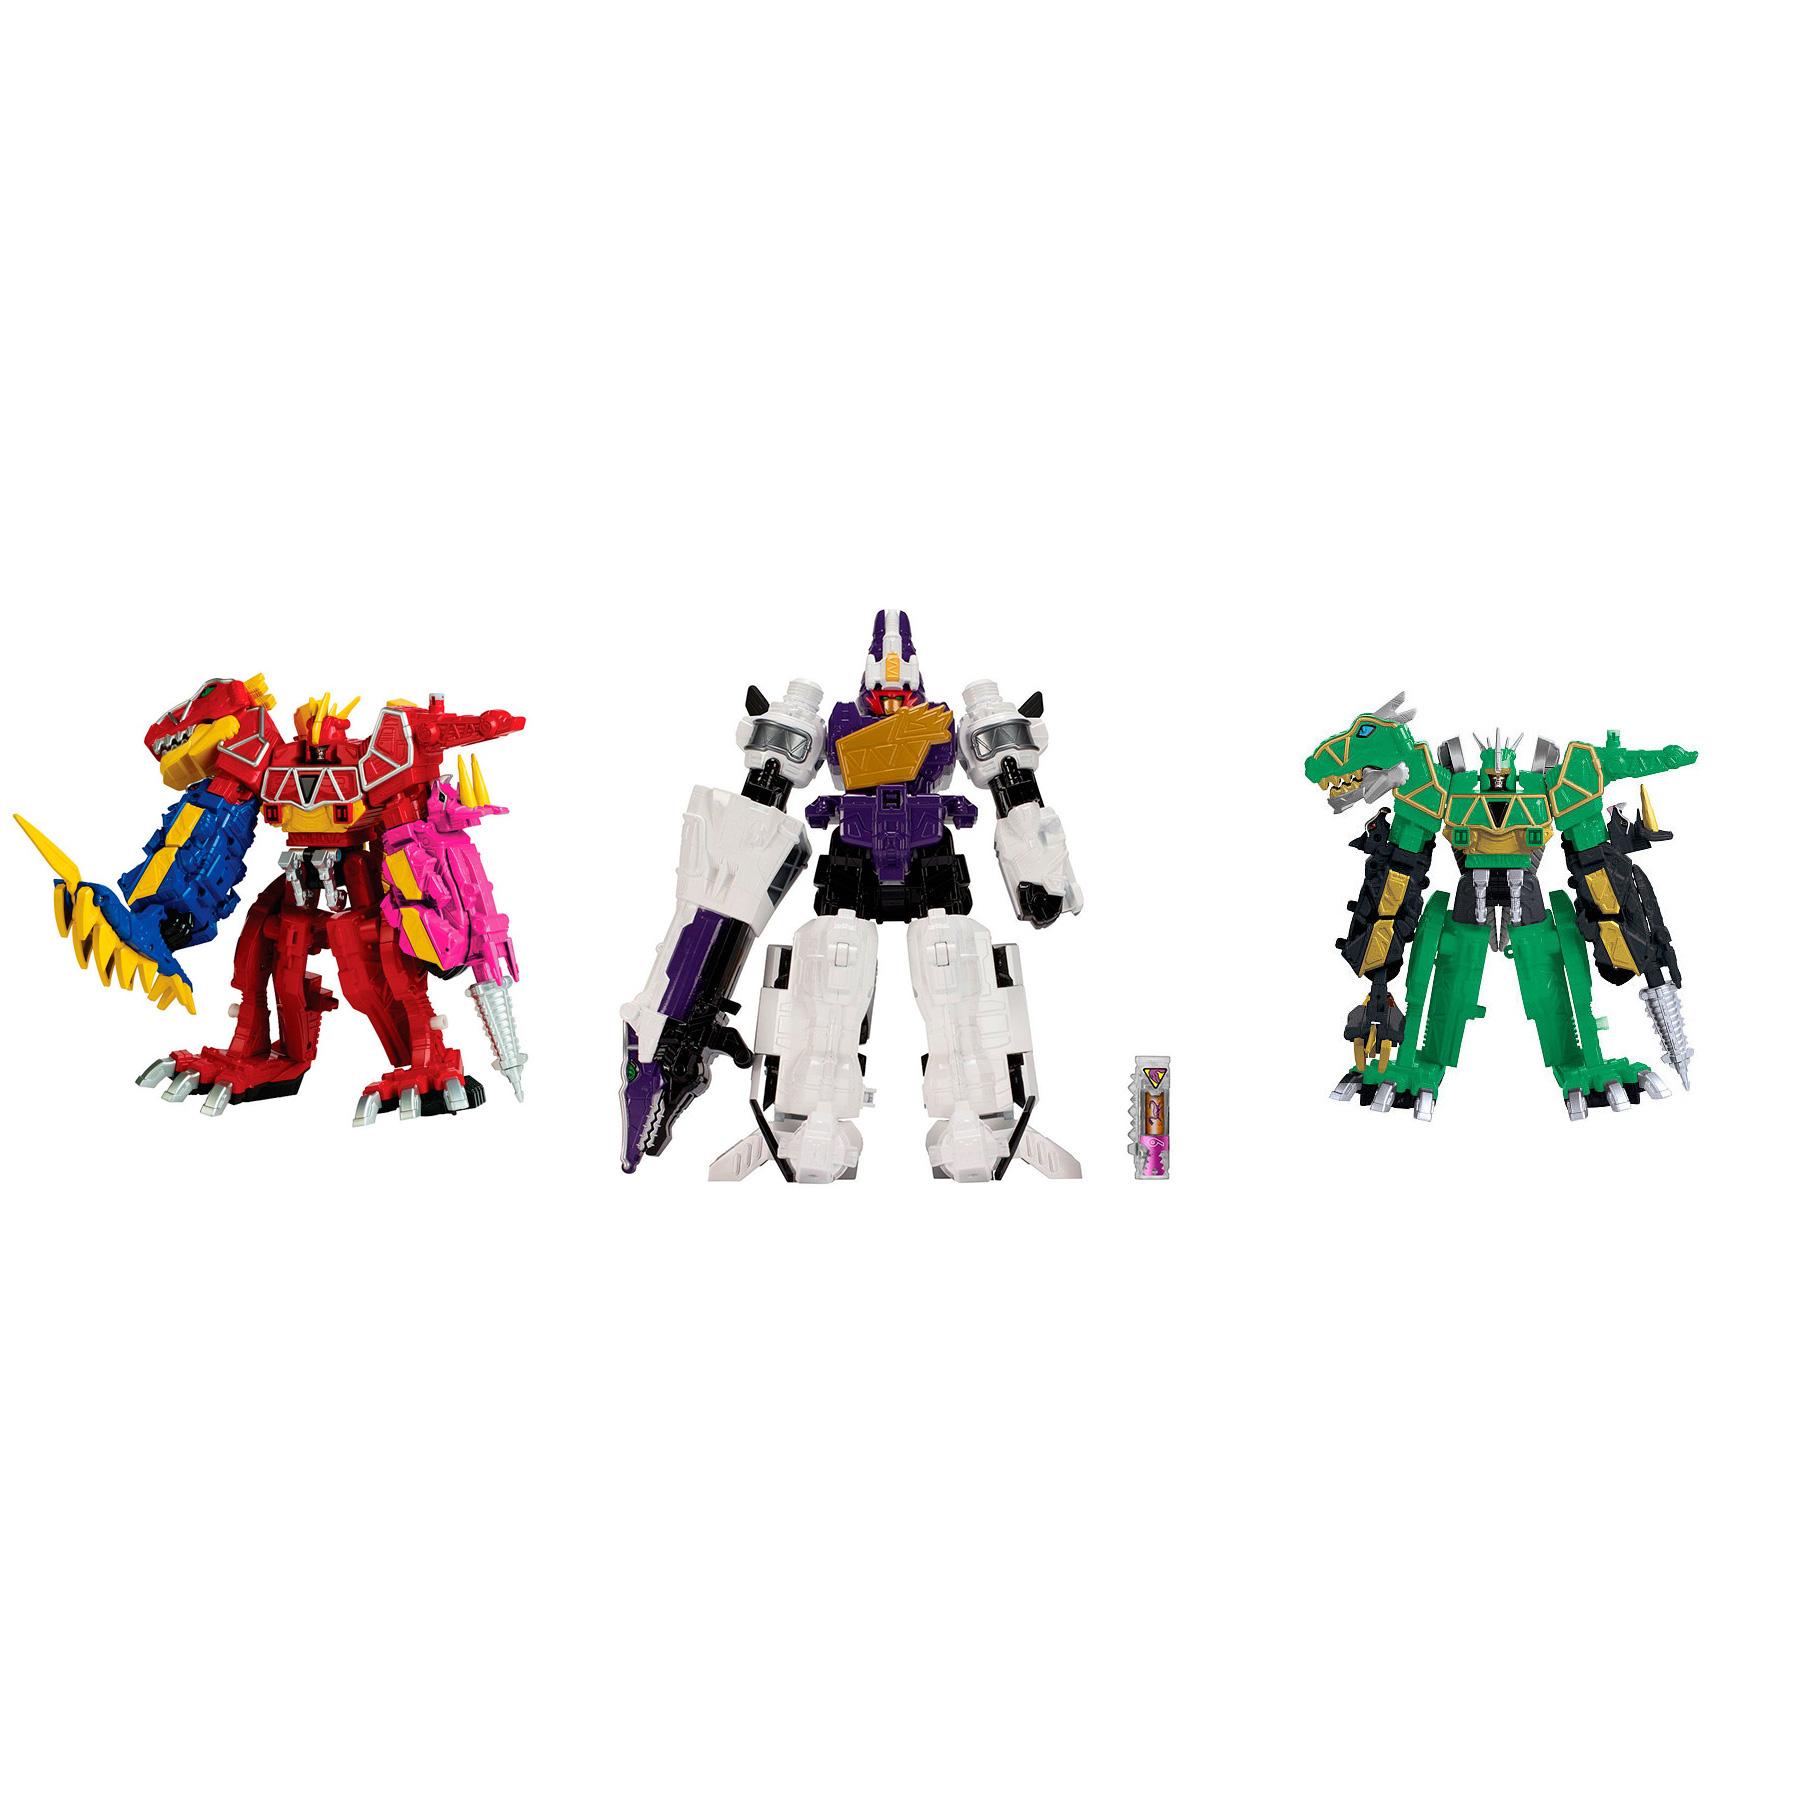 Робот Дино Мегазорд Dx с дино-зарядом, 3 вида из серии Power RangersPower Rangers (Могучие Рейнджеры)<br>Робот Дино Мегазорд Dx с дино-зарядом, 3 вида из серии Power Rangers<br>